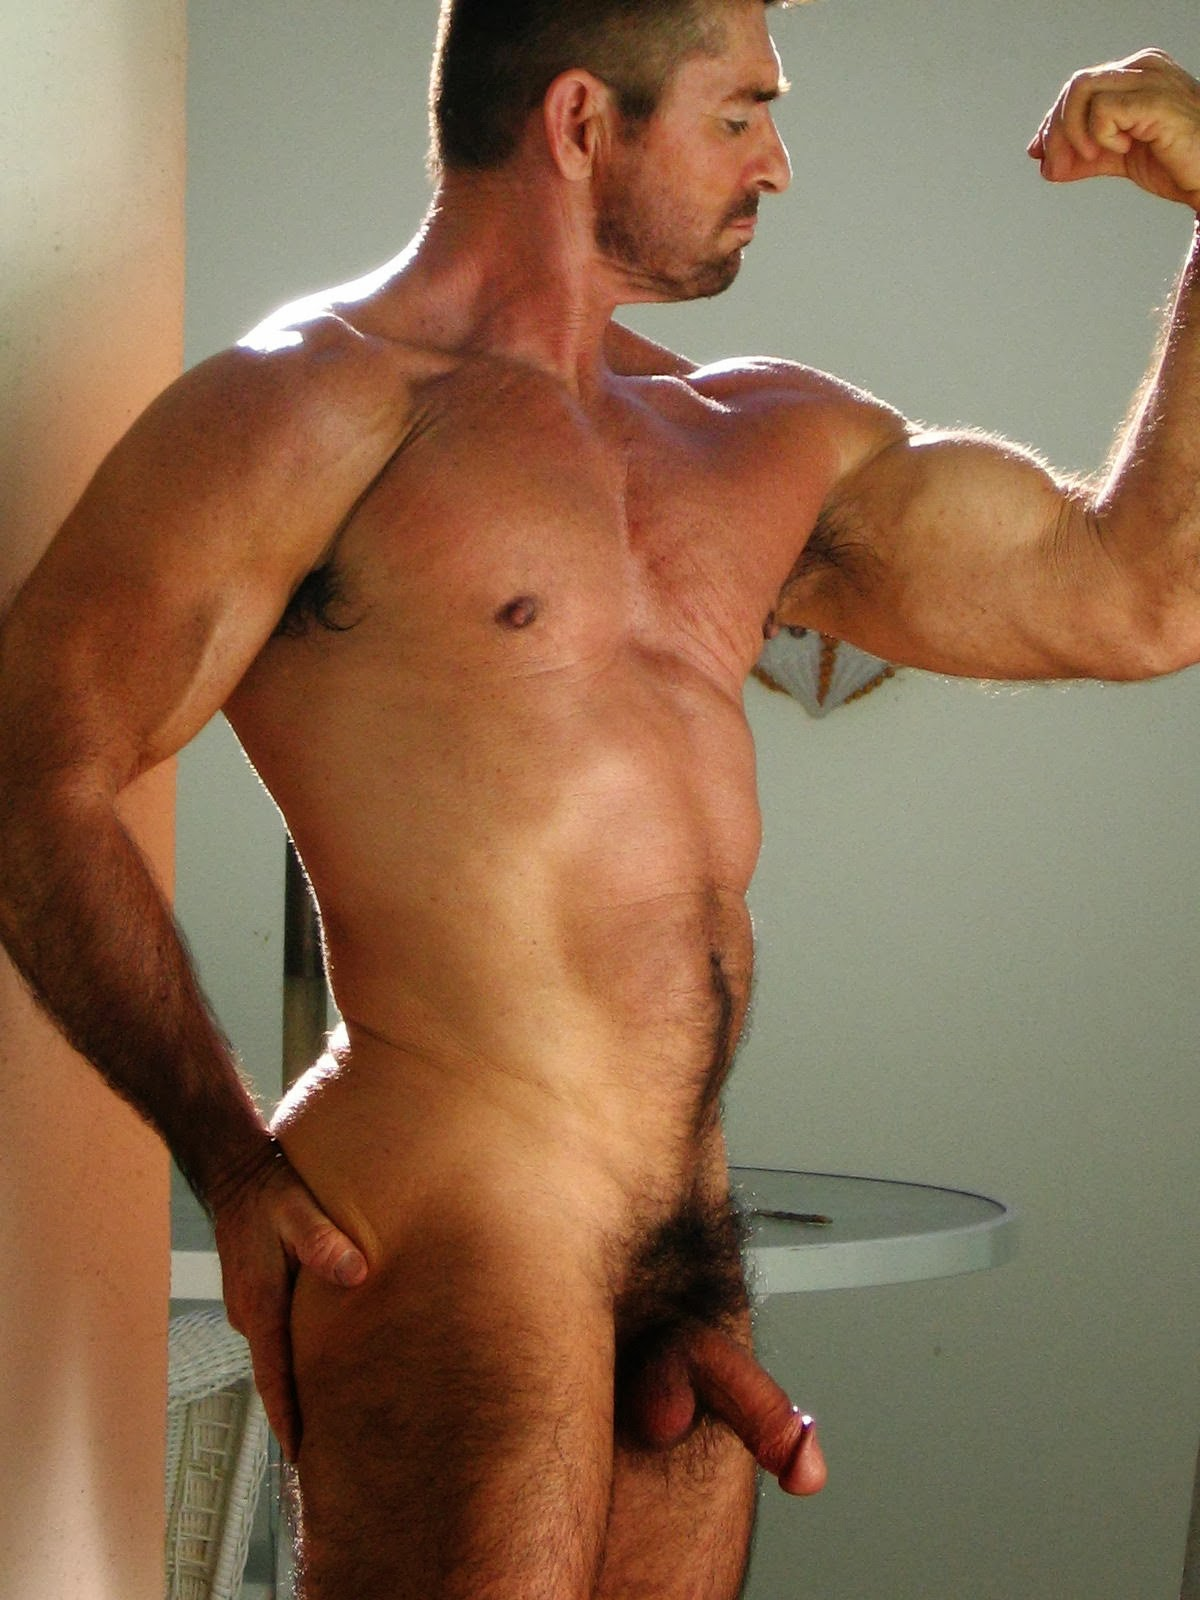 Naked Sports Men  Hot Girl Hd Wallpaper-1358